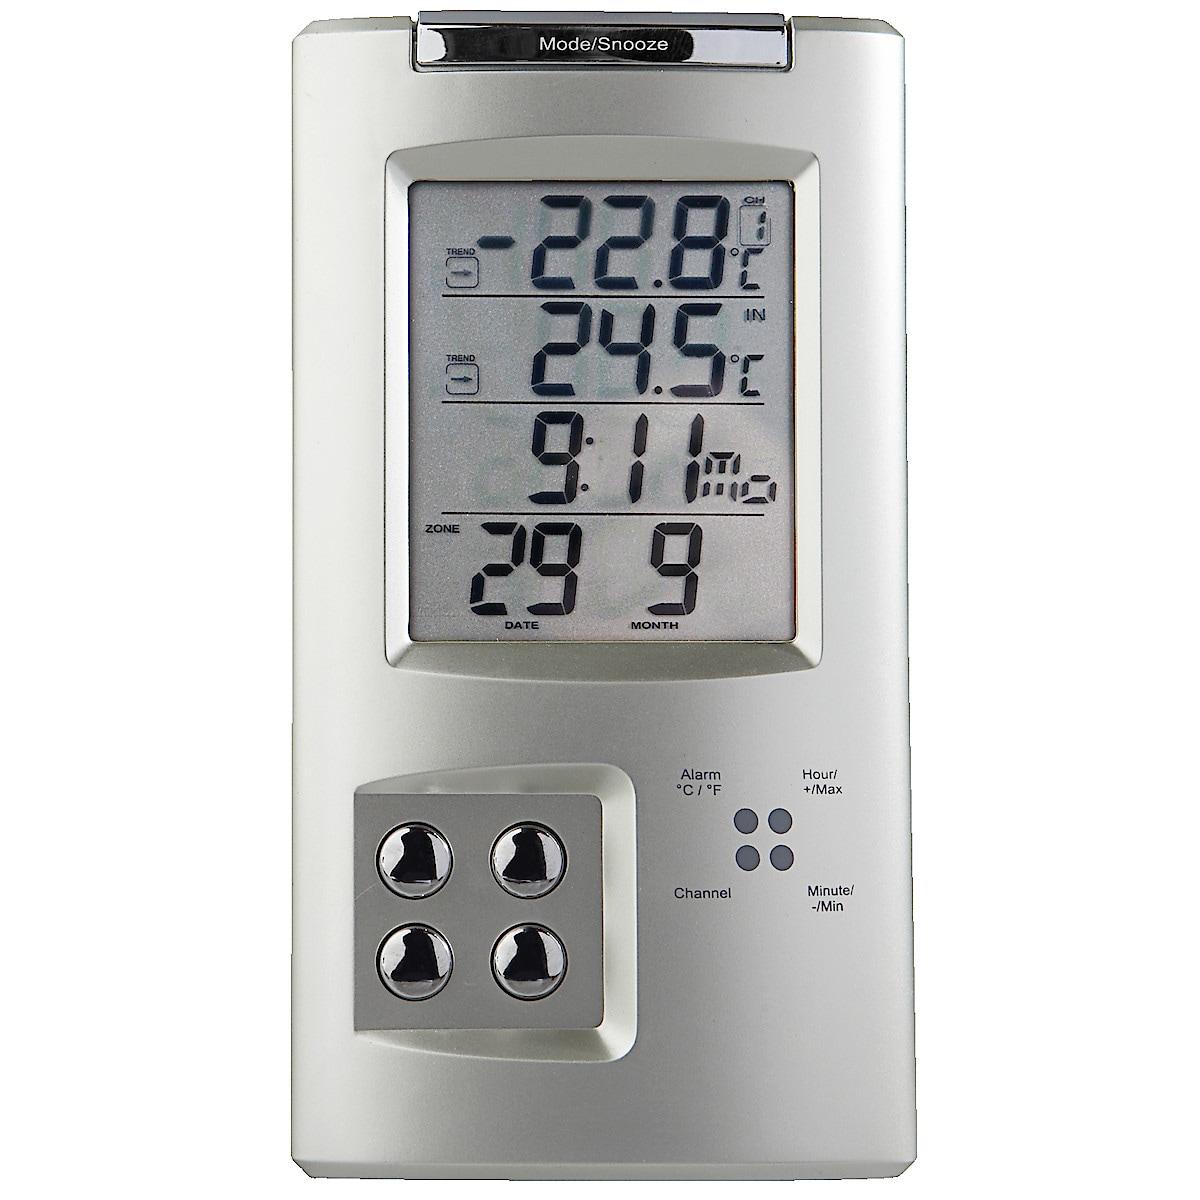 Trådløst termometer/hygrometer